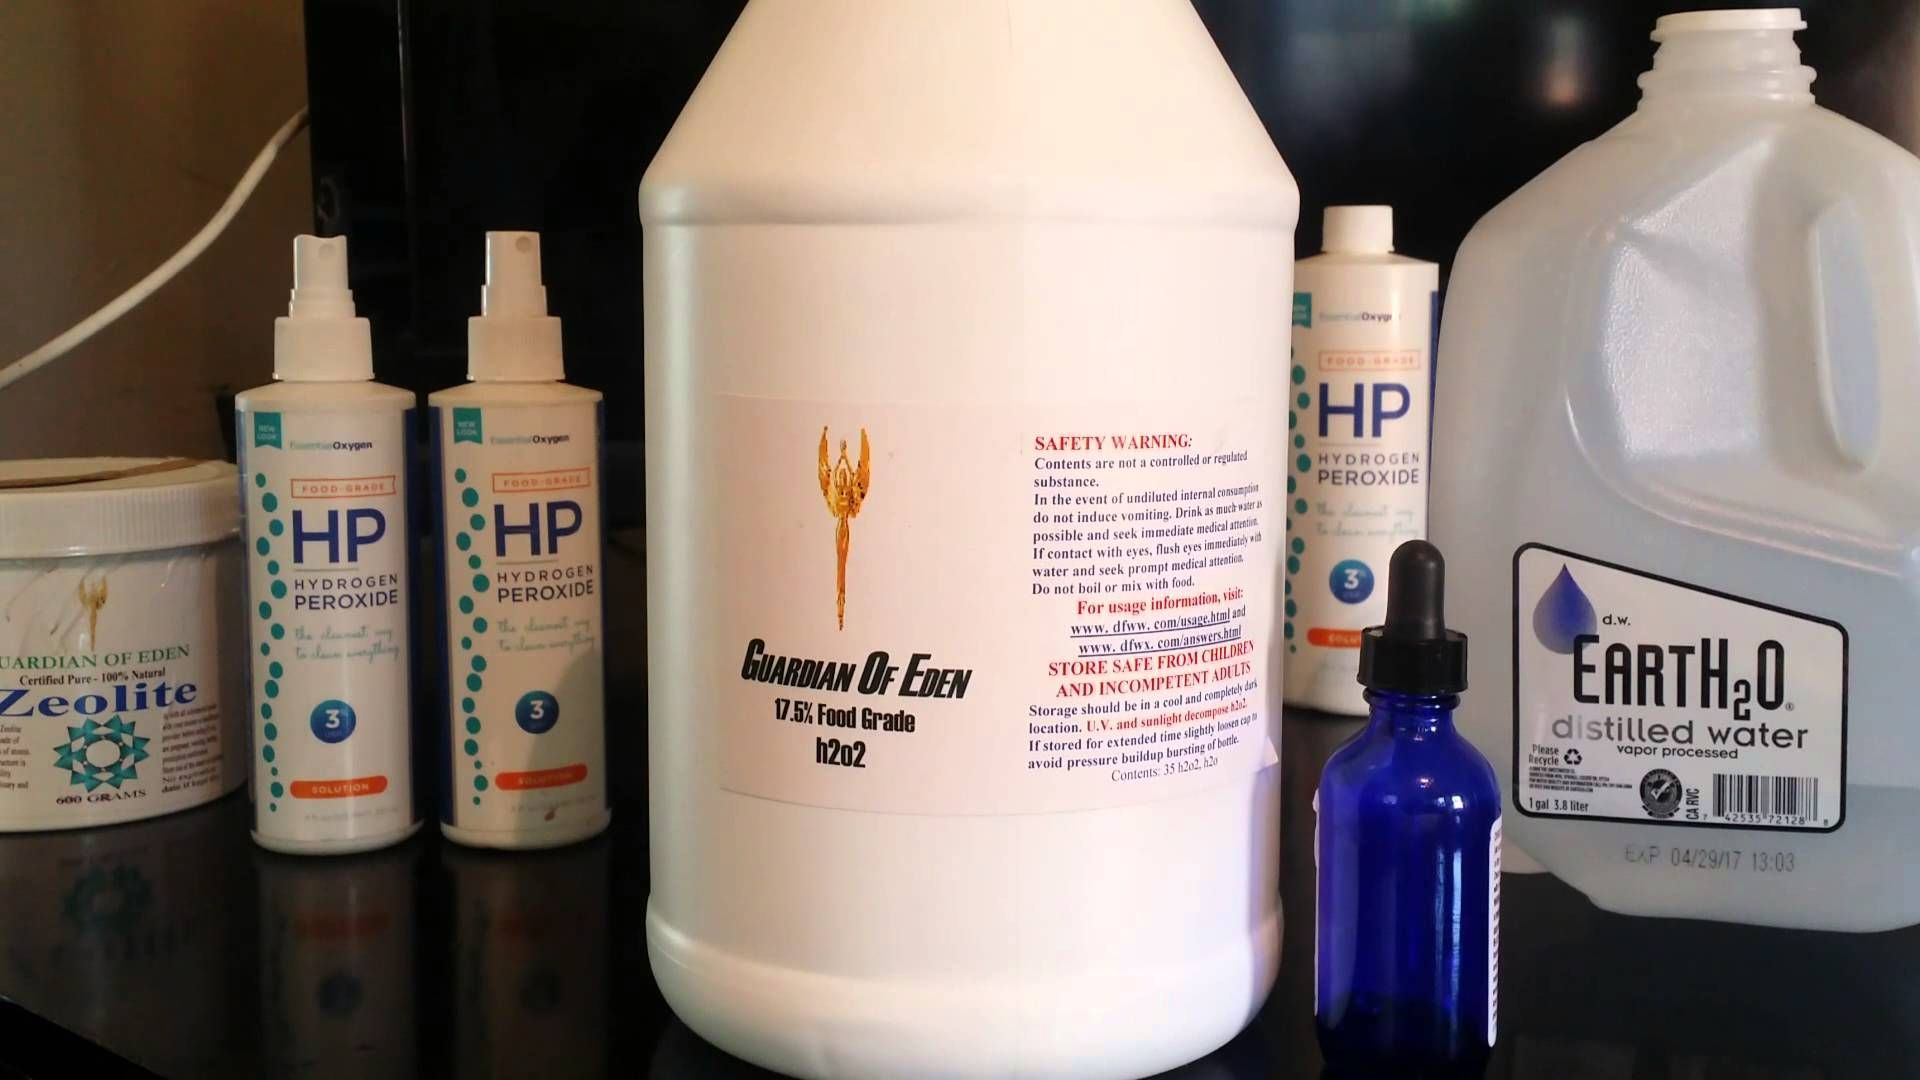 THE GUARDIAN OF EDEN (Hydrogen Peroxide Food Grade) Food